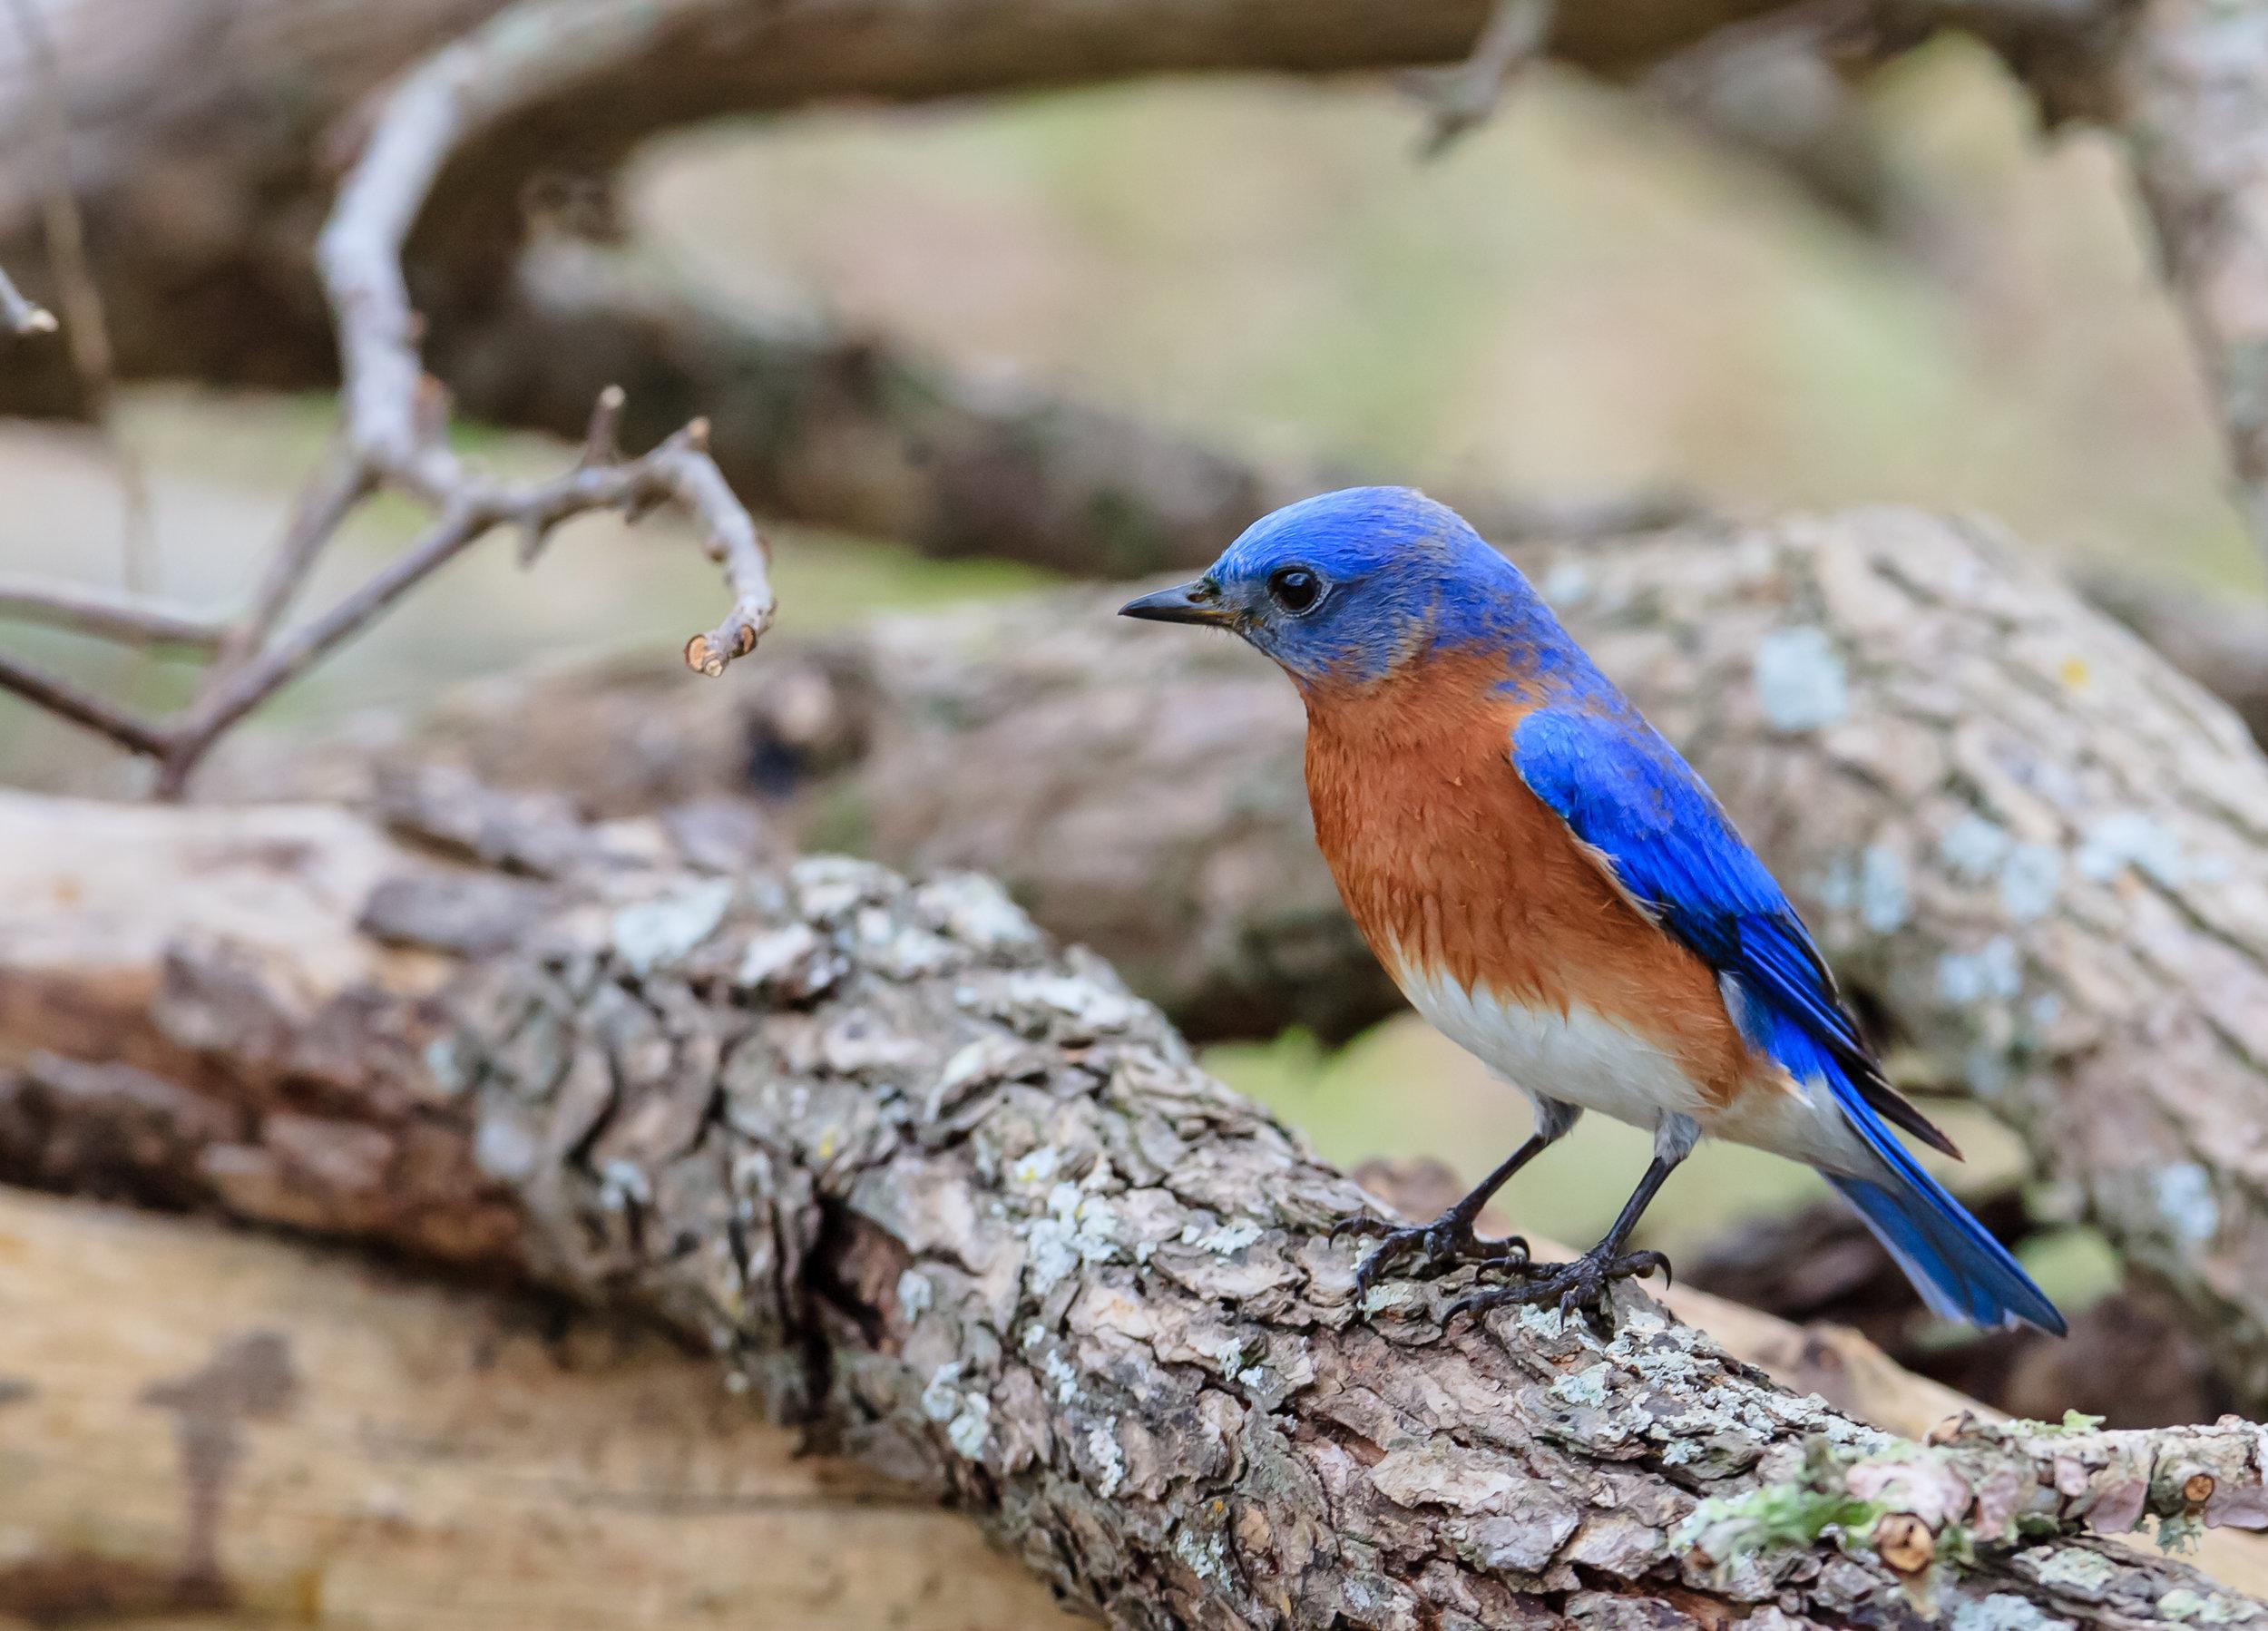 Species: Eastern Bluebird Photo Credit: Damian Martinez Date: Jan 2017 Location: Crescent Bend Nature Park